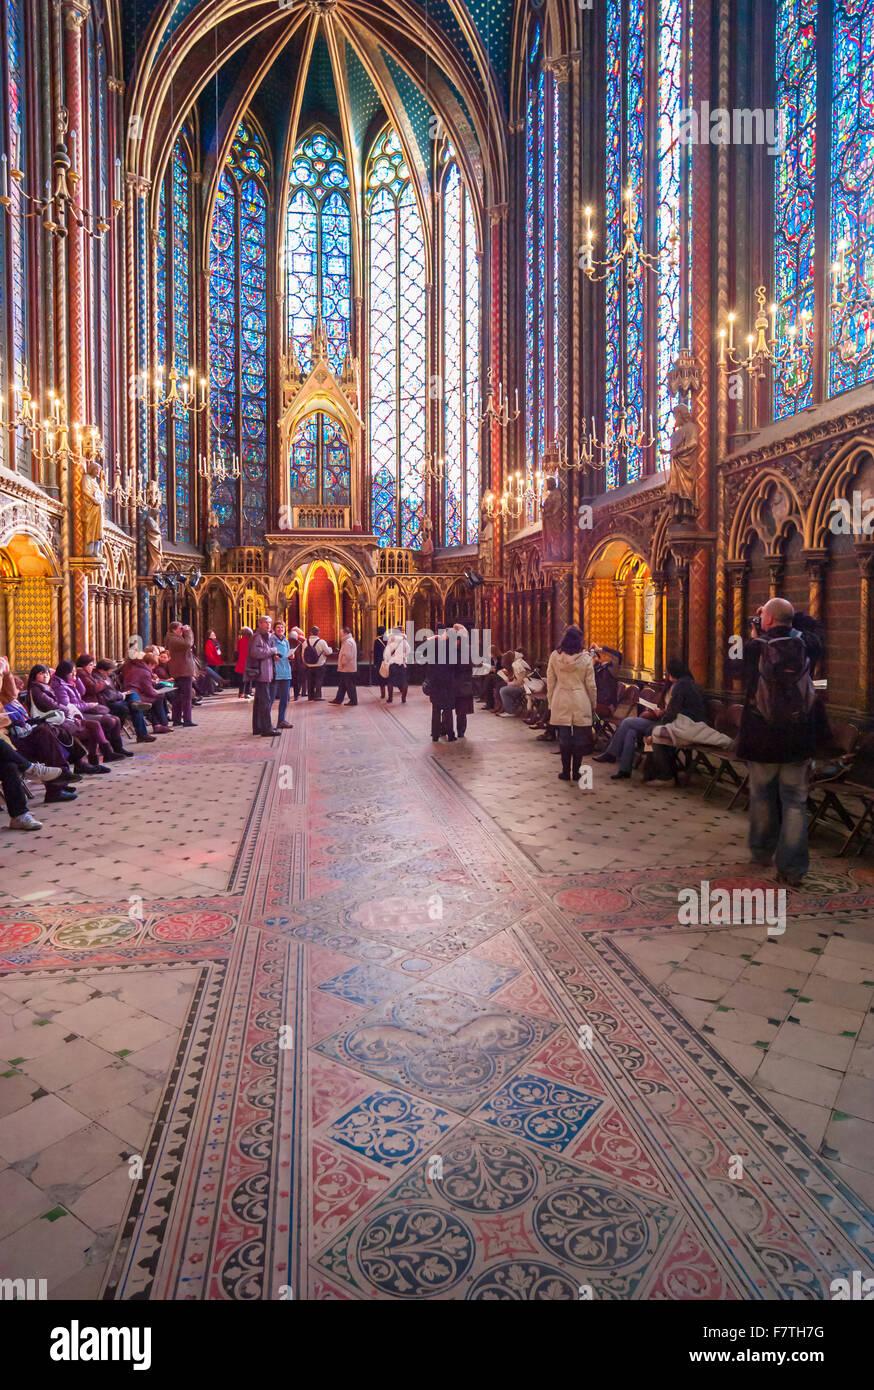 Sainte Chapelle Stained Glass Stock Photos Amp Sainte